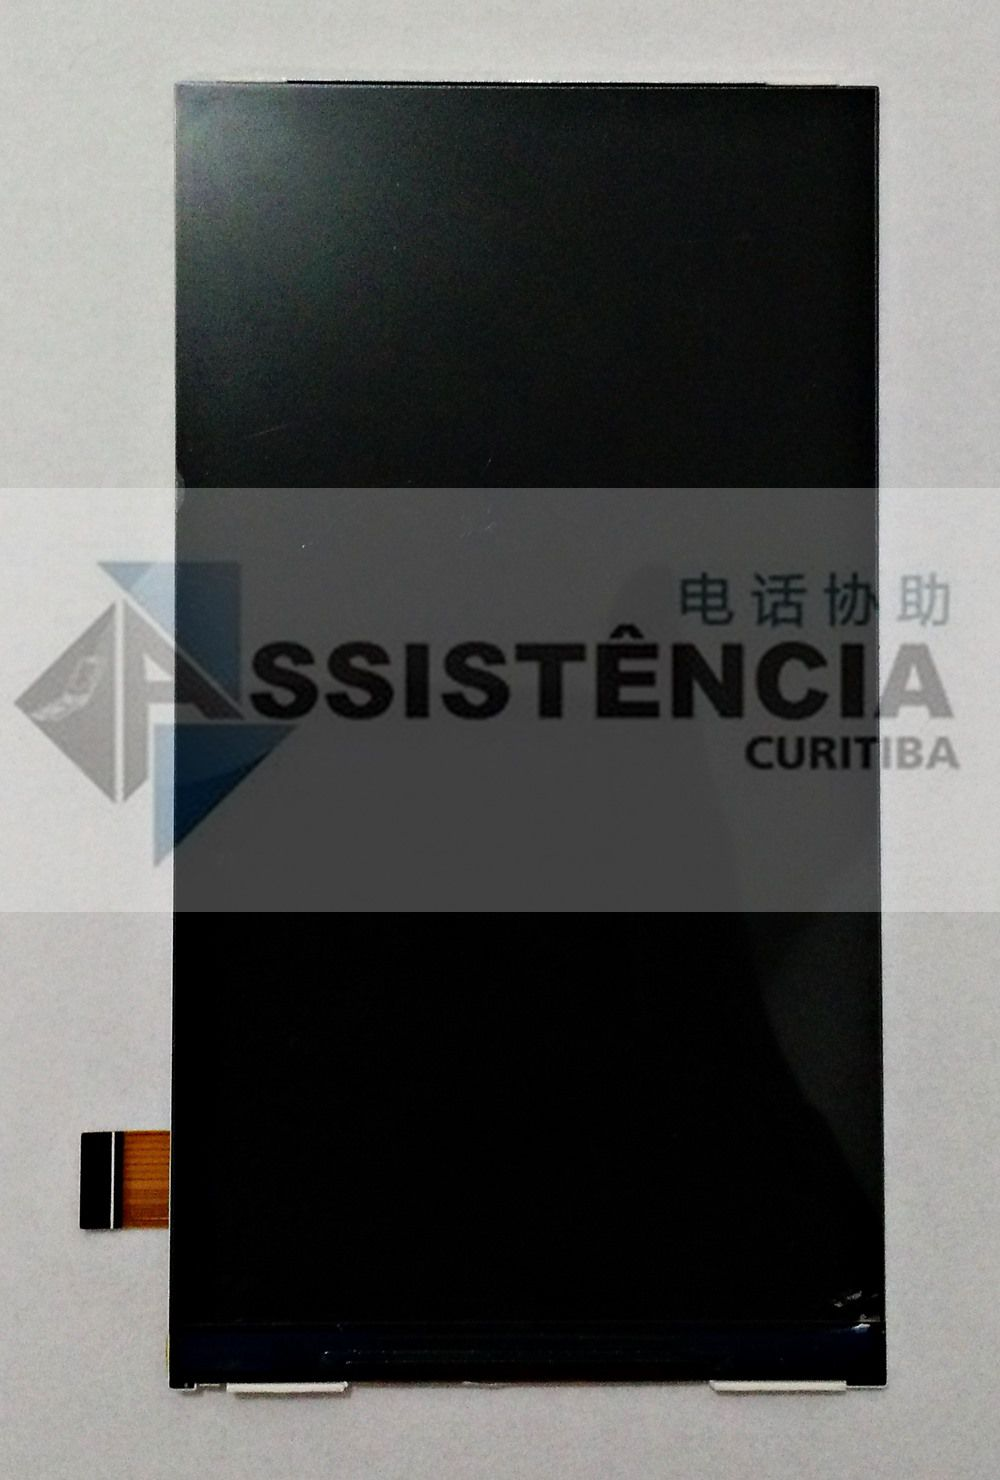 TELA DISPLAY LCD CELULAR POSITIVO SELFIE S455